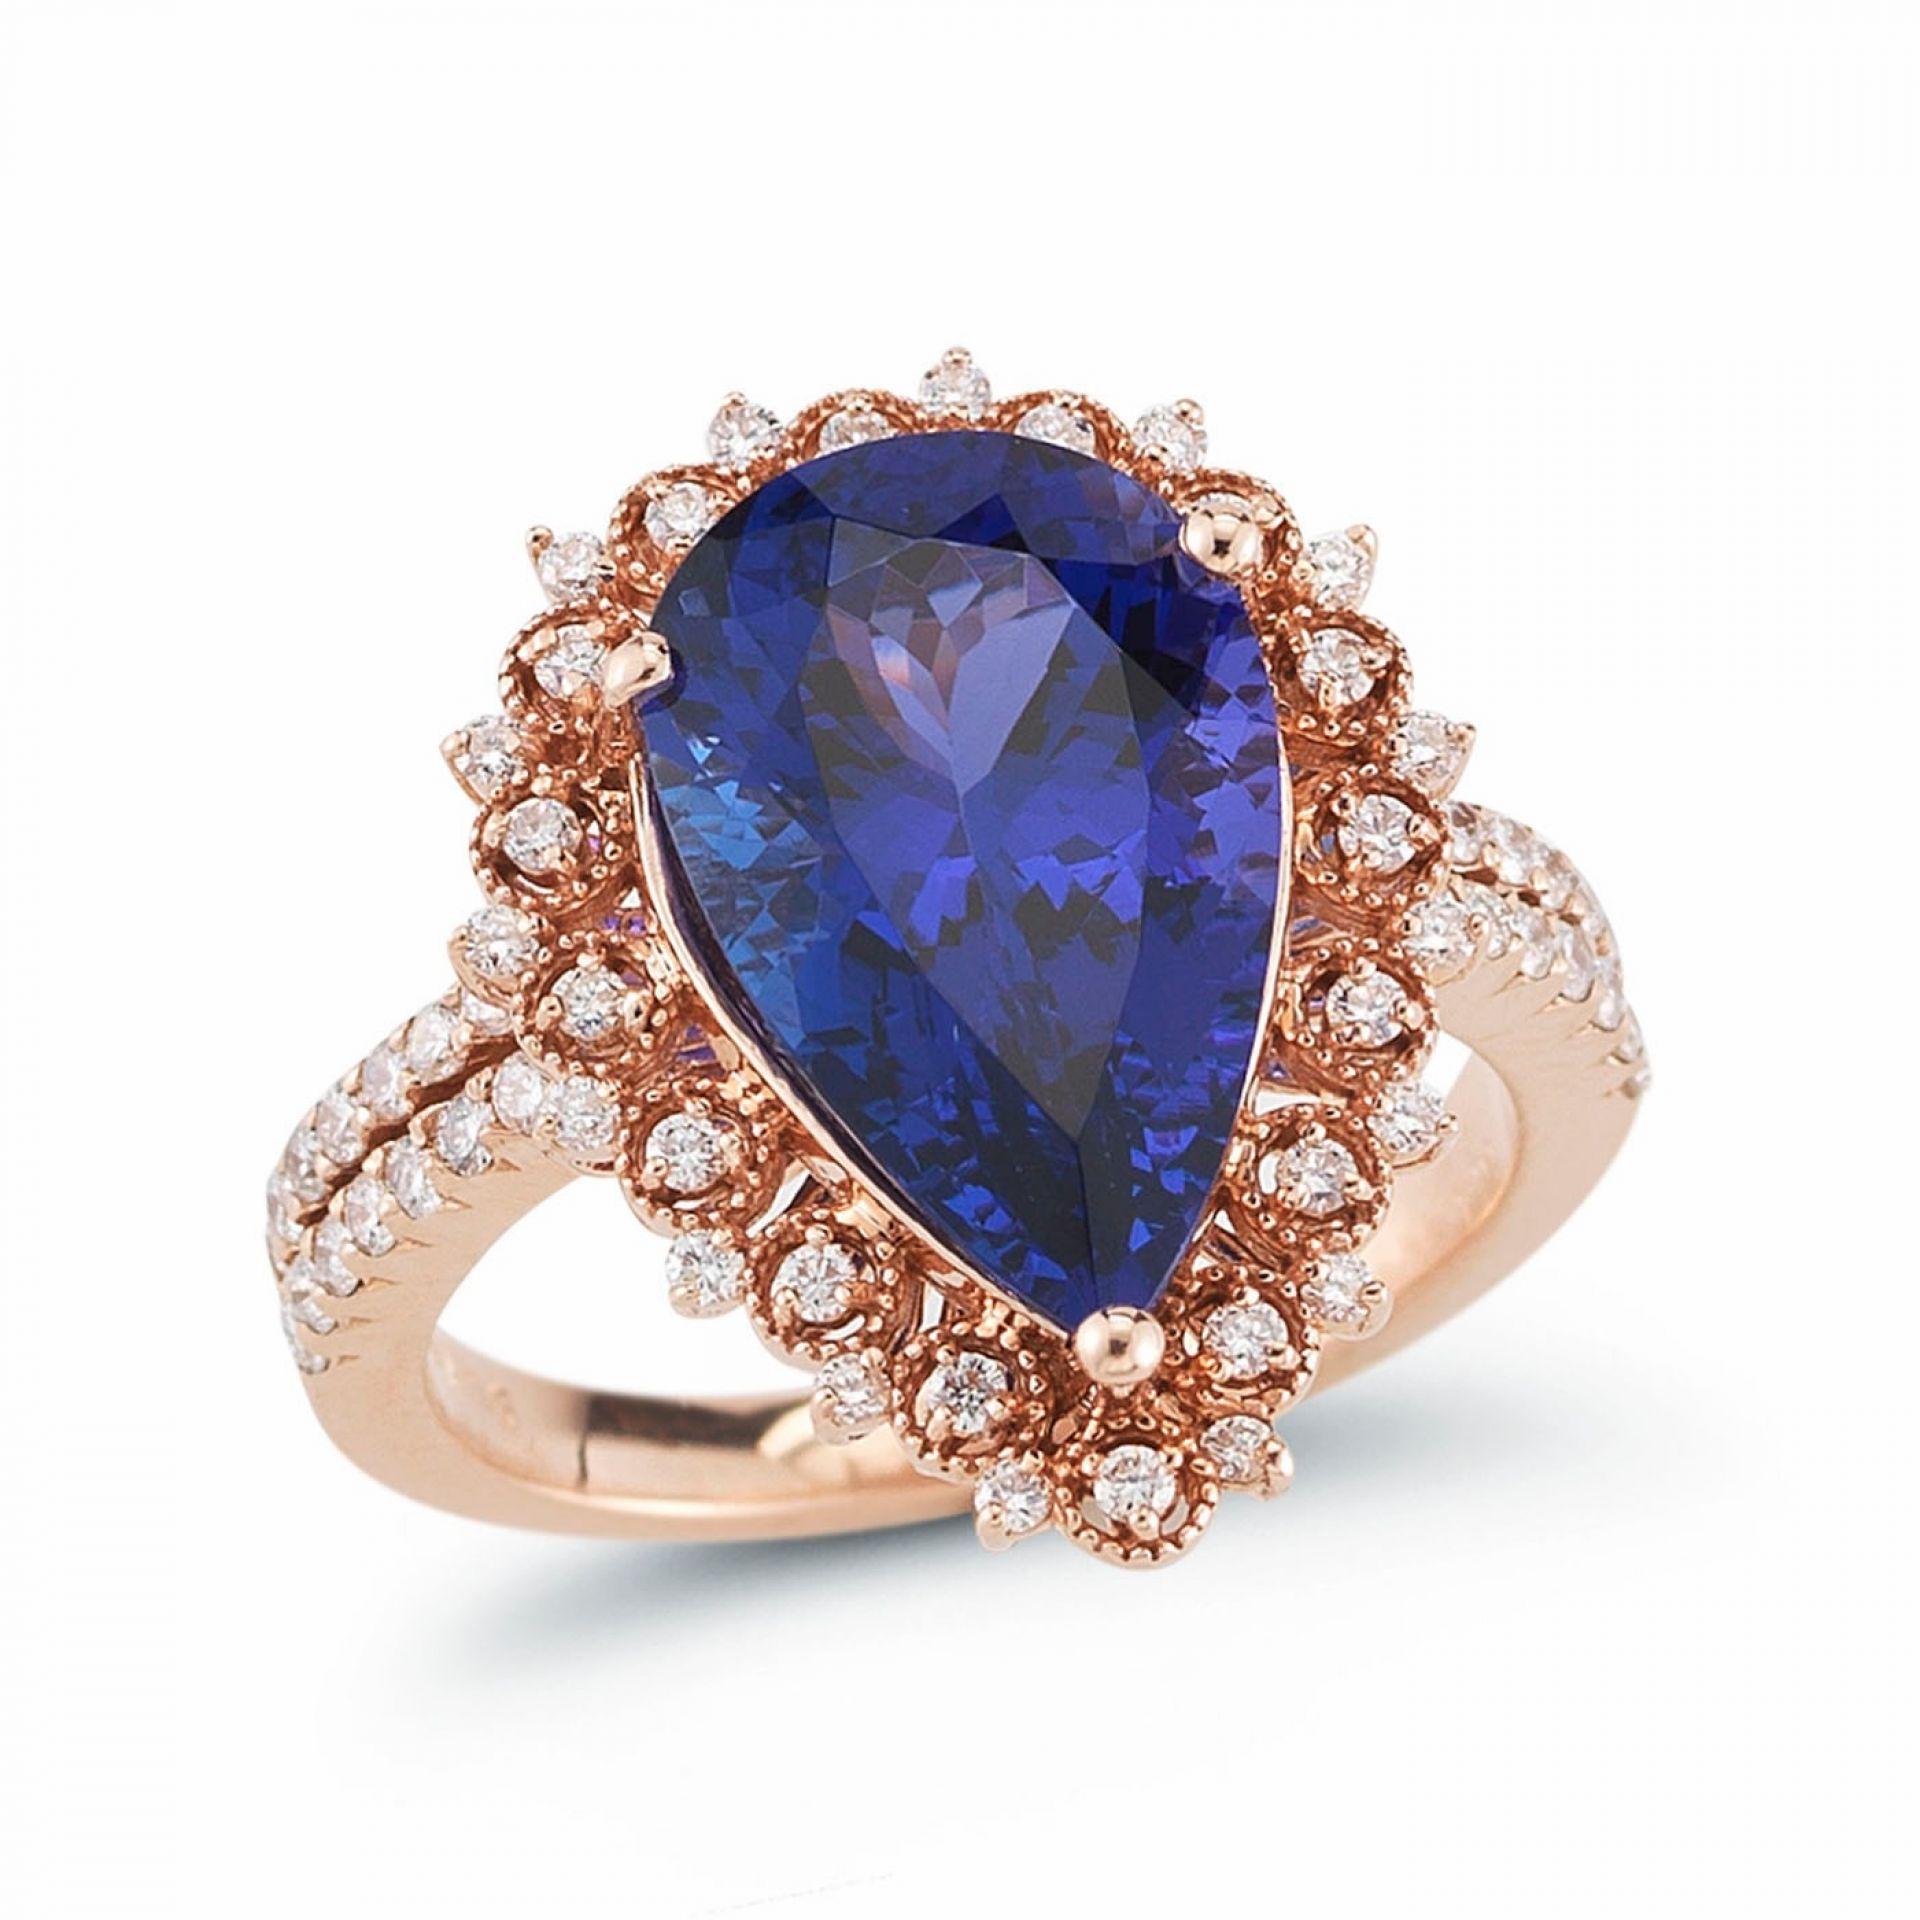 Pear Shape Tanzanite & Diamond Ring R106028-2R